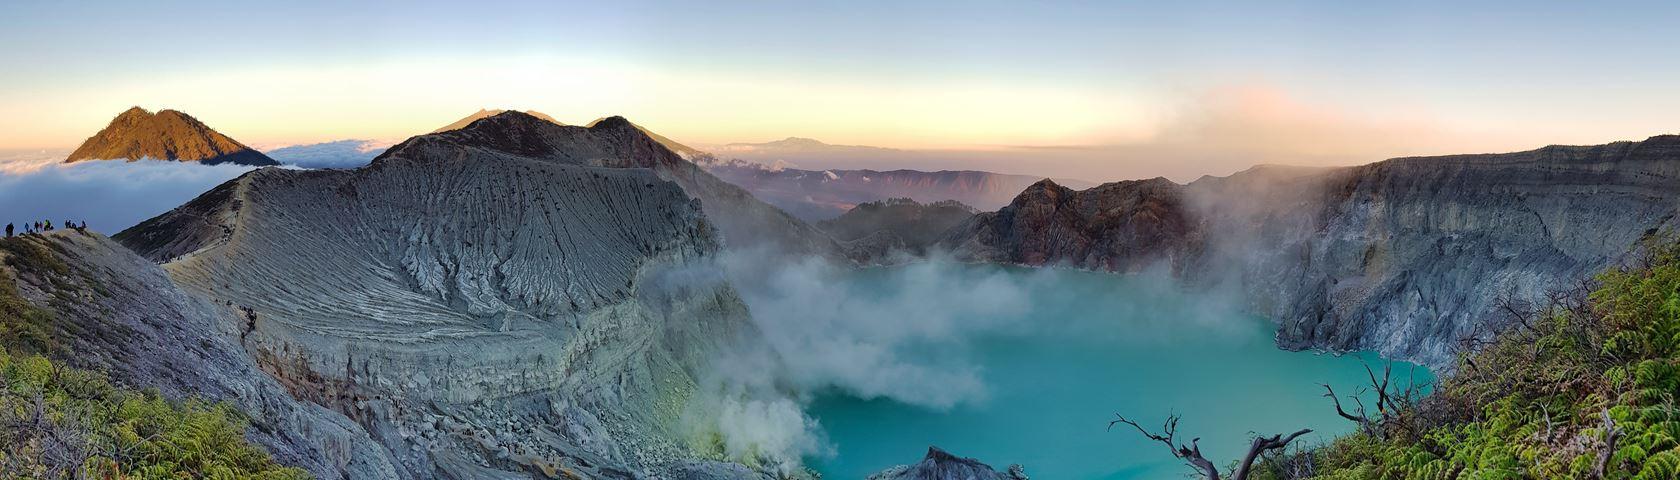 Kawah Ijen Crater on Java Island